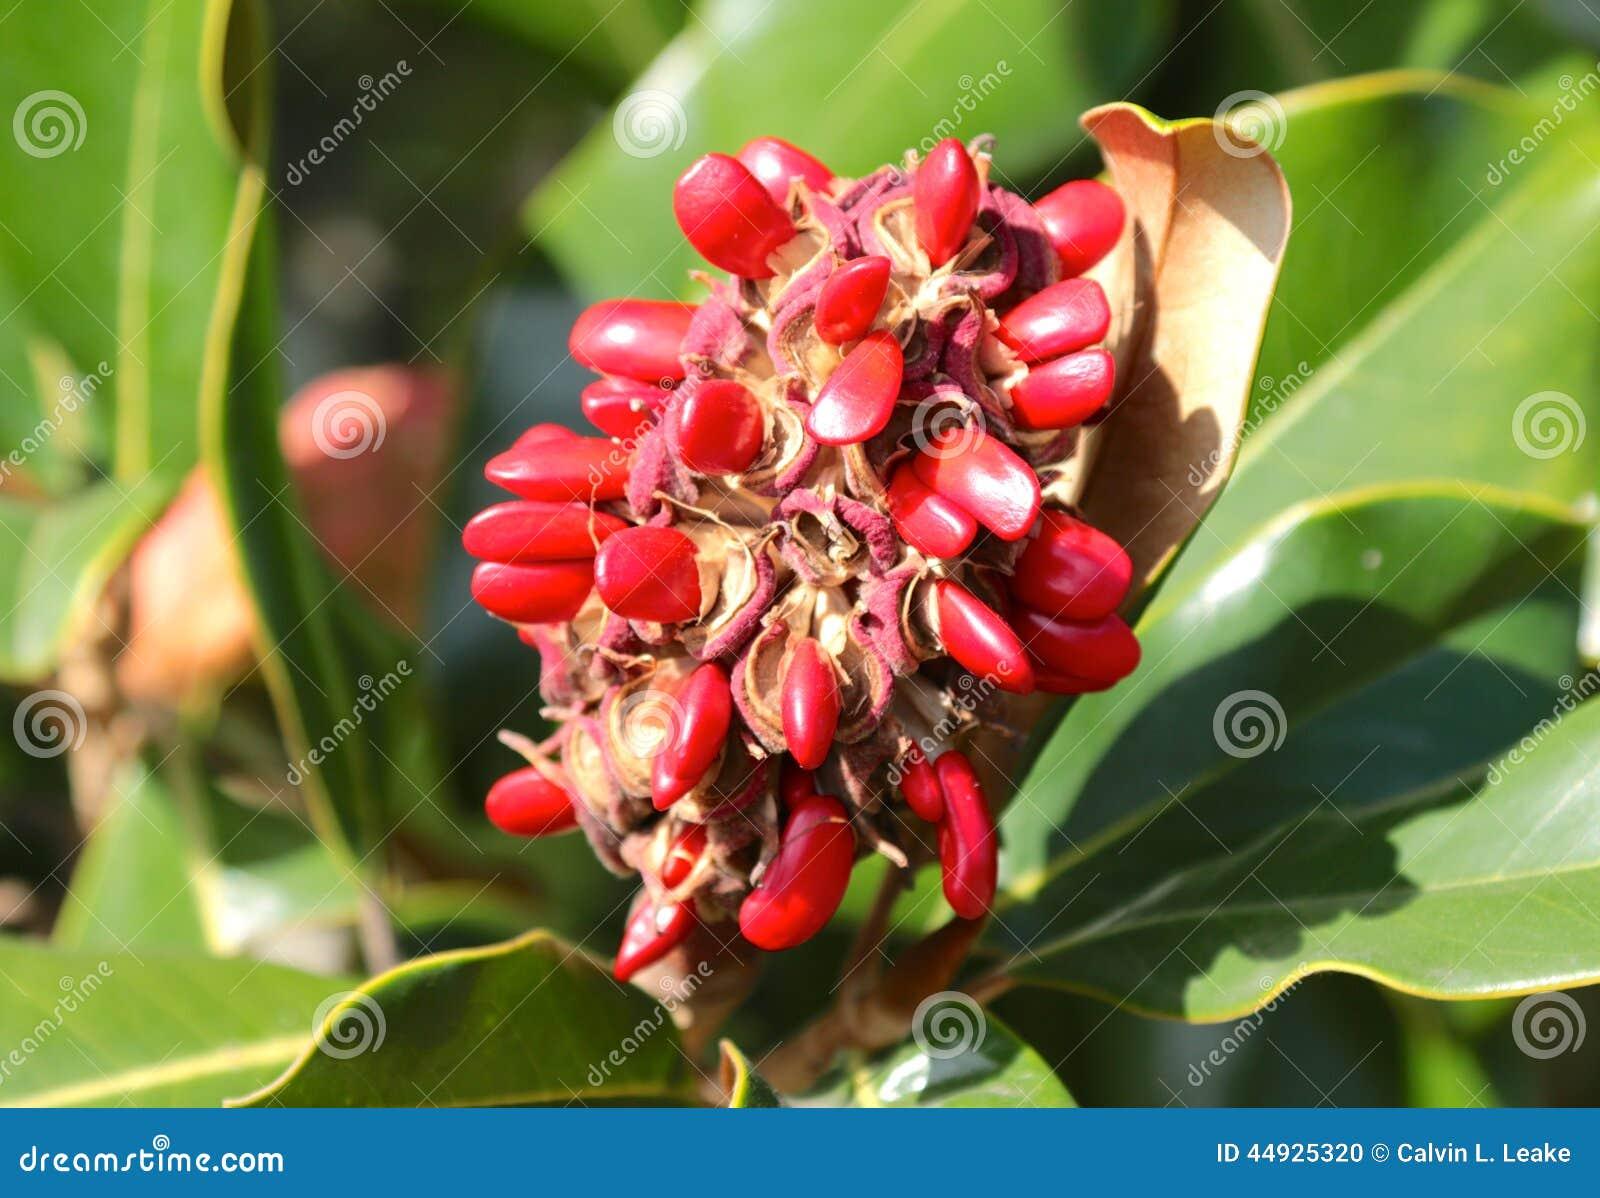 Magnolia Tree Seeds Stock Photo Image 44925320